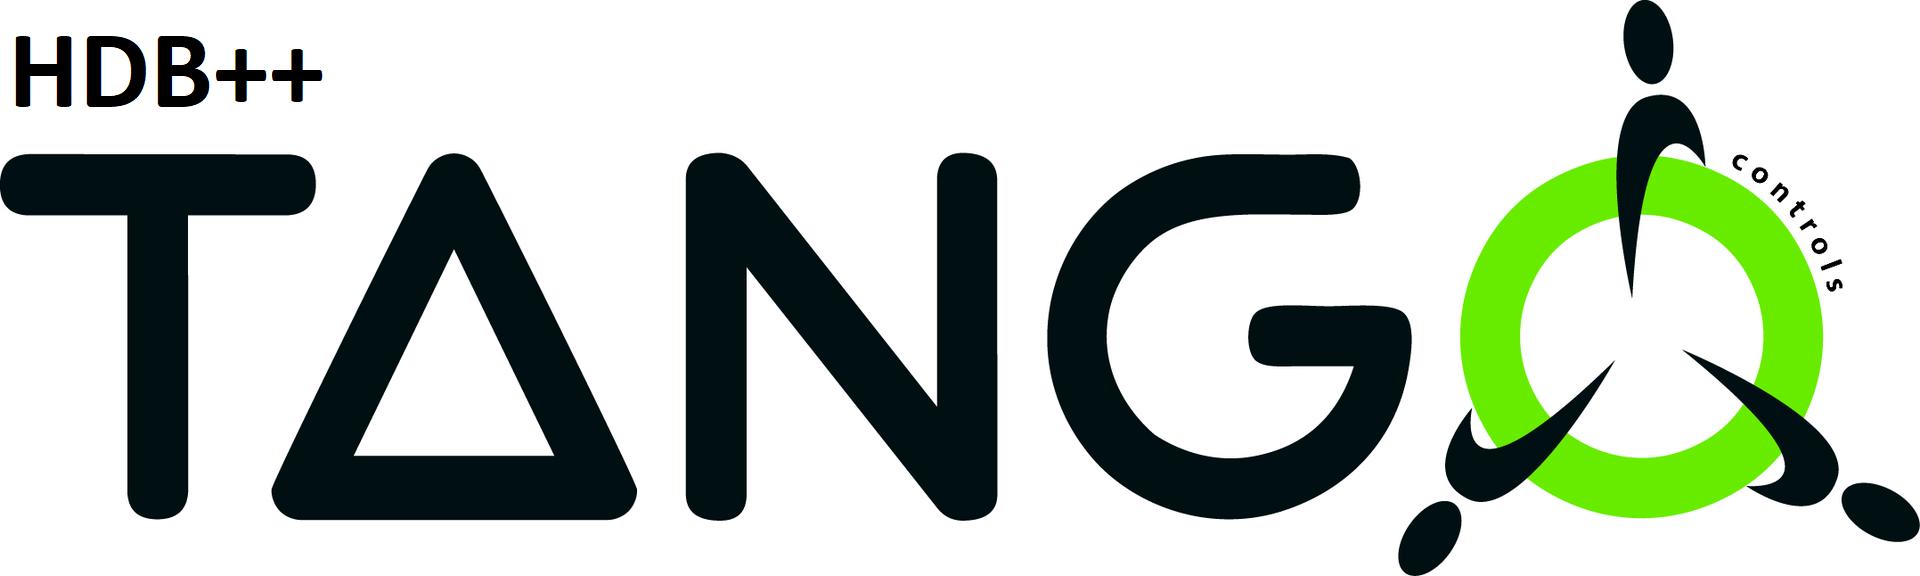 HDB TANGO Archiving System